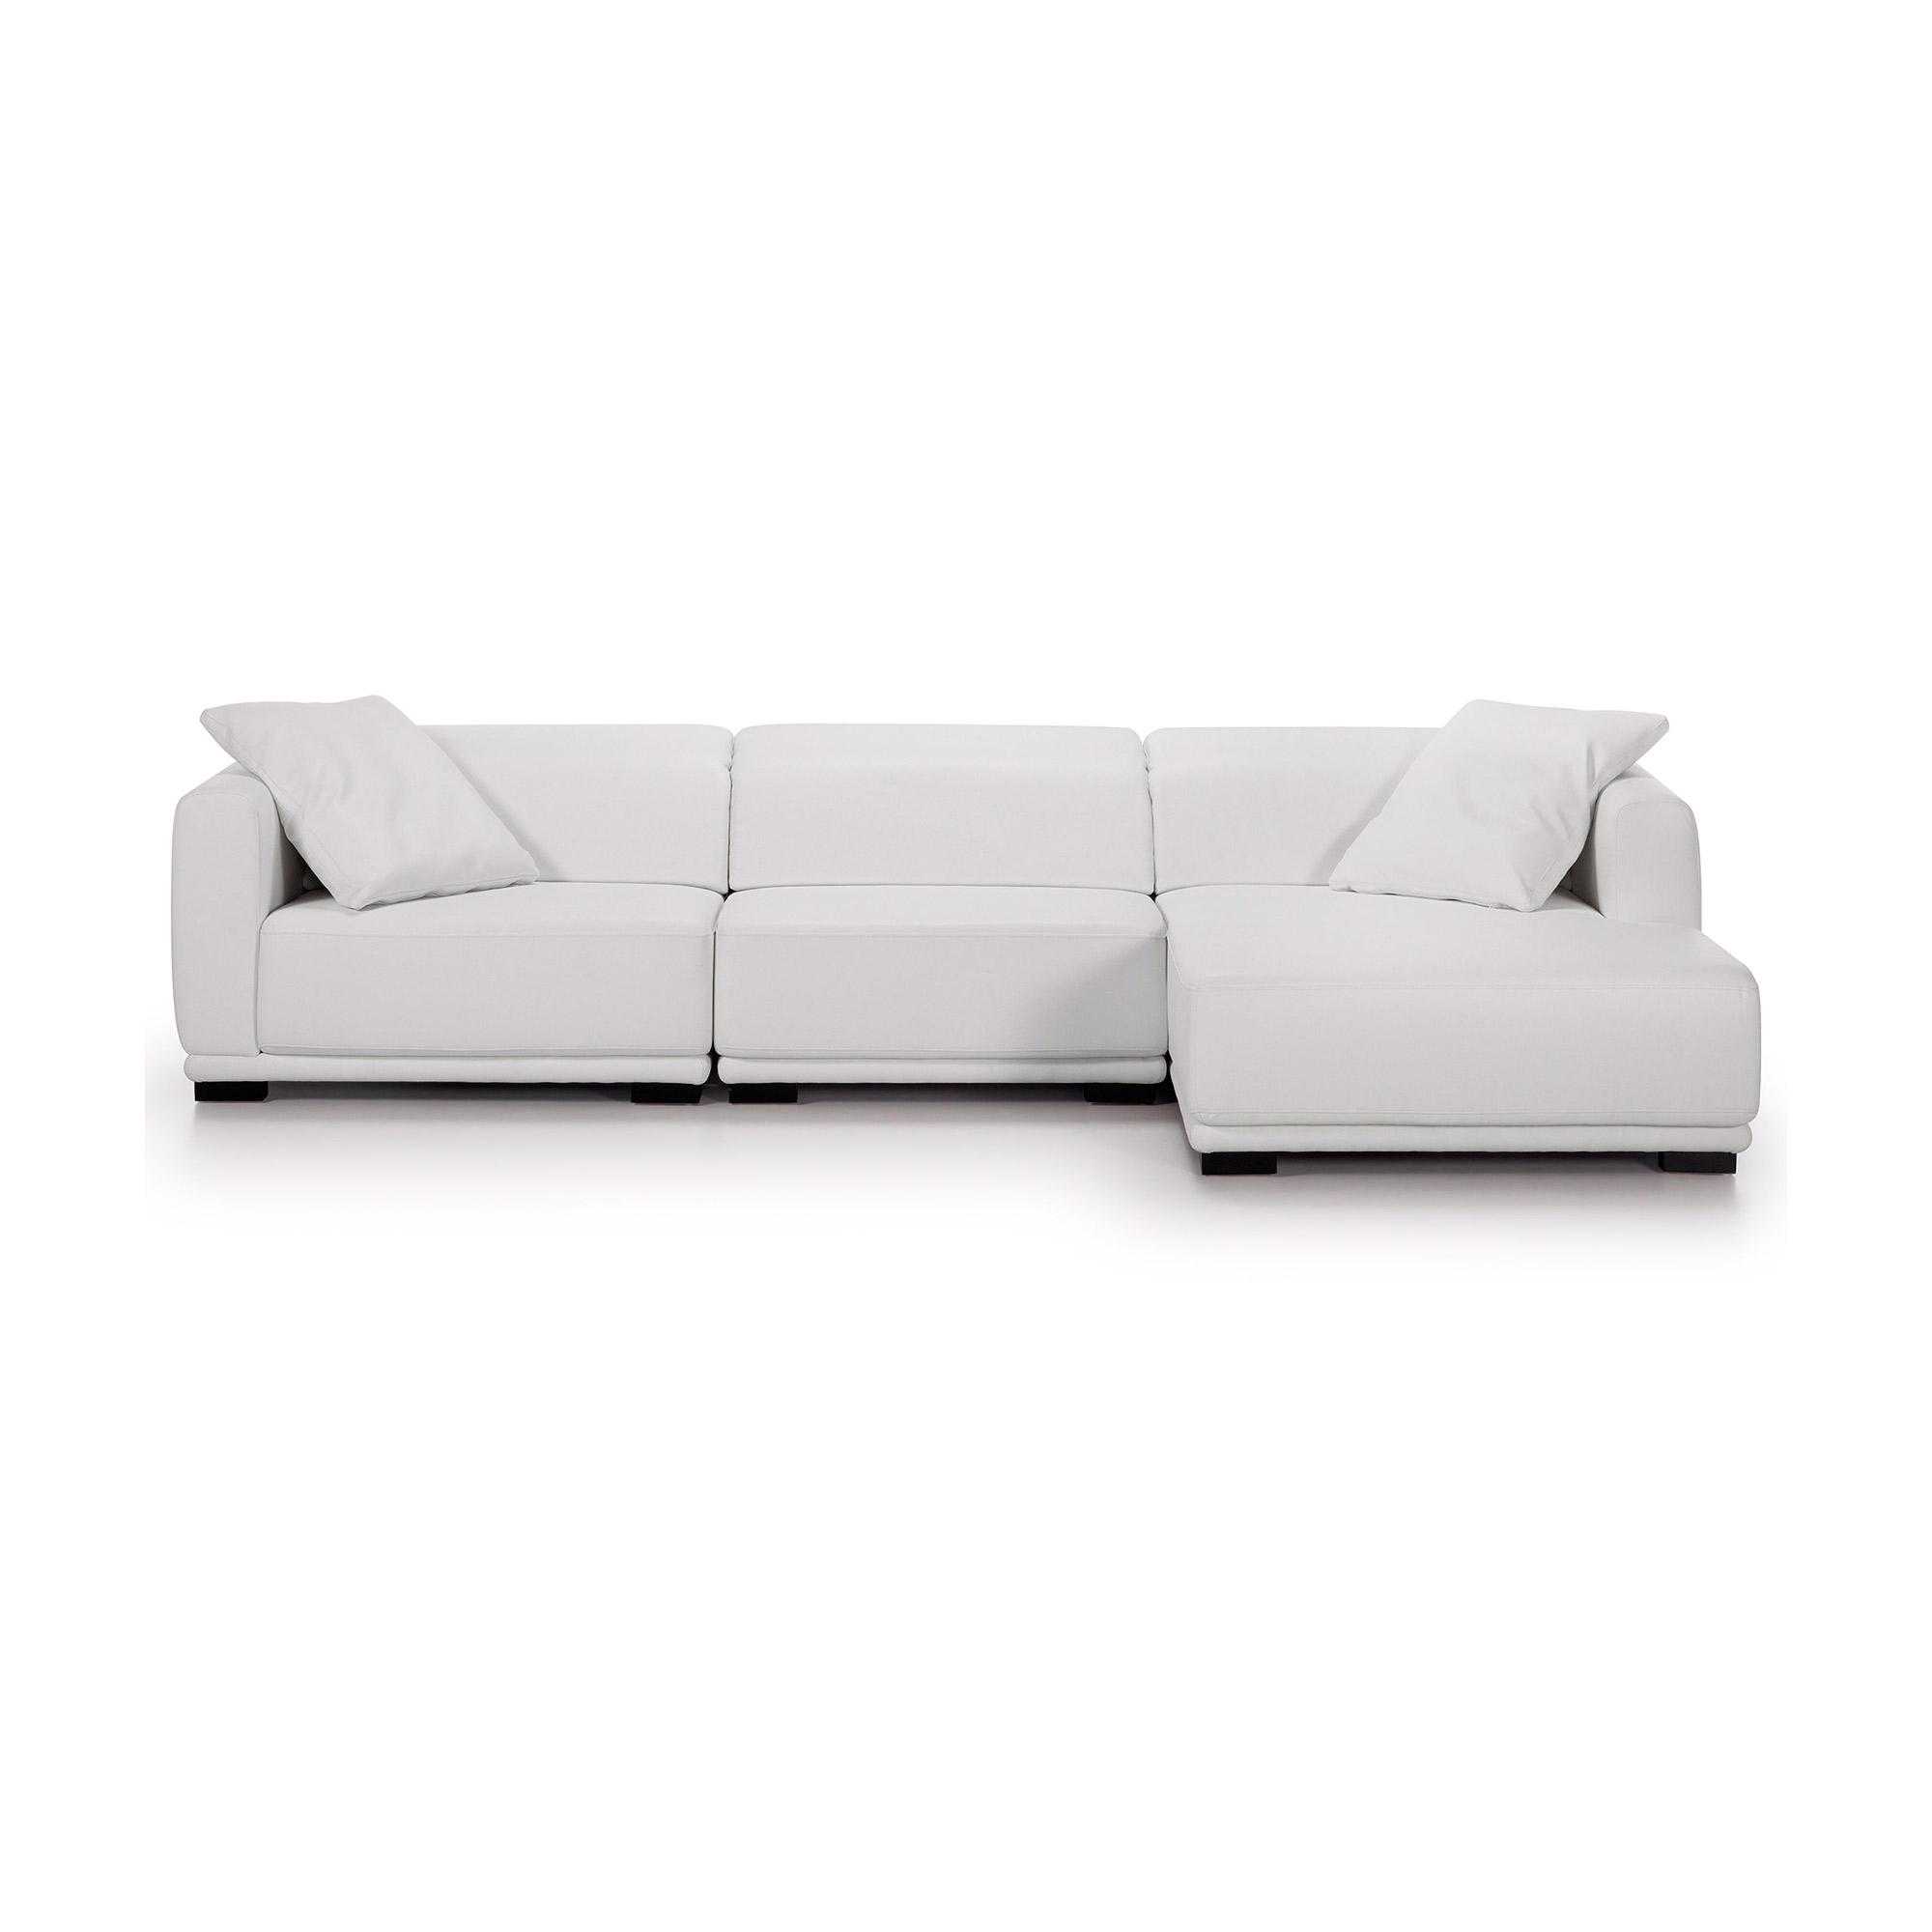 italy sofa 3p chaise derecha recl eco piel blanco puro. Black Bedroom Furniture Sets. Home Design Ideas